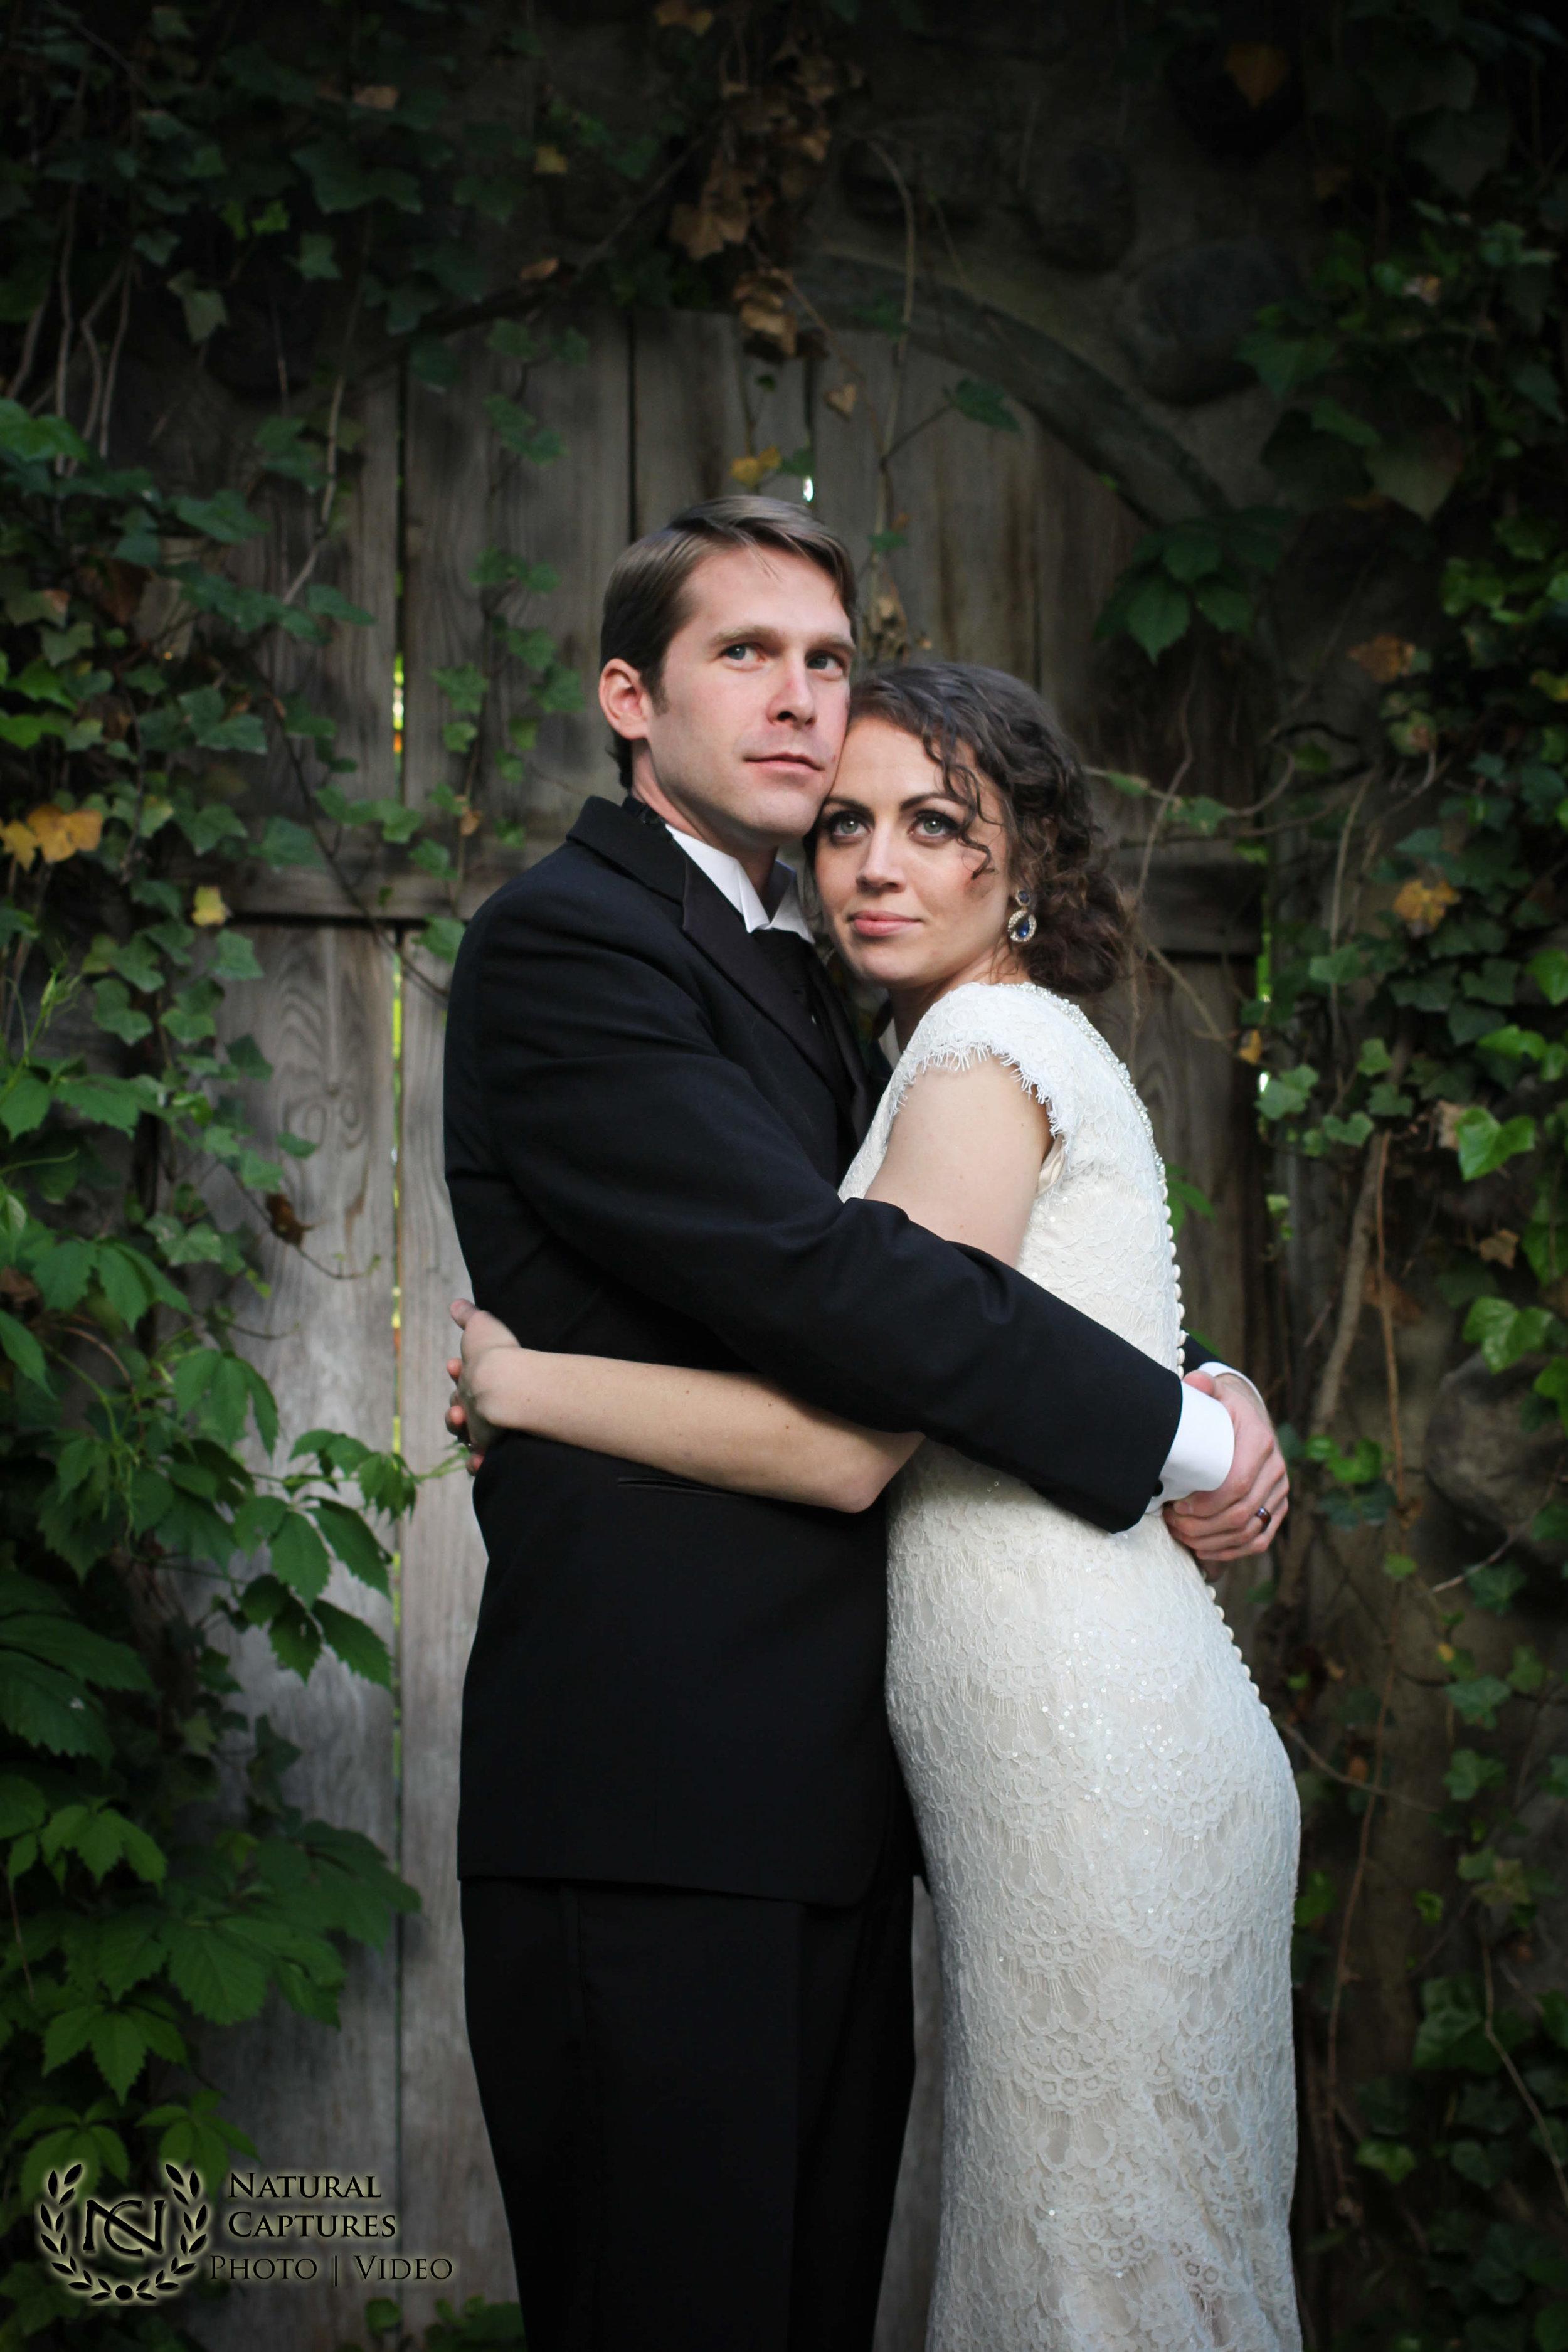 Draper Utah Temple Wedding Photography (12 of 12)